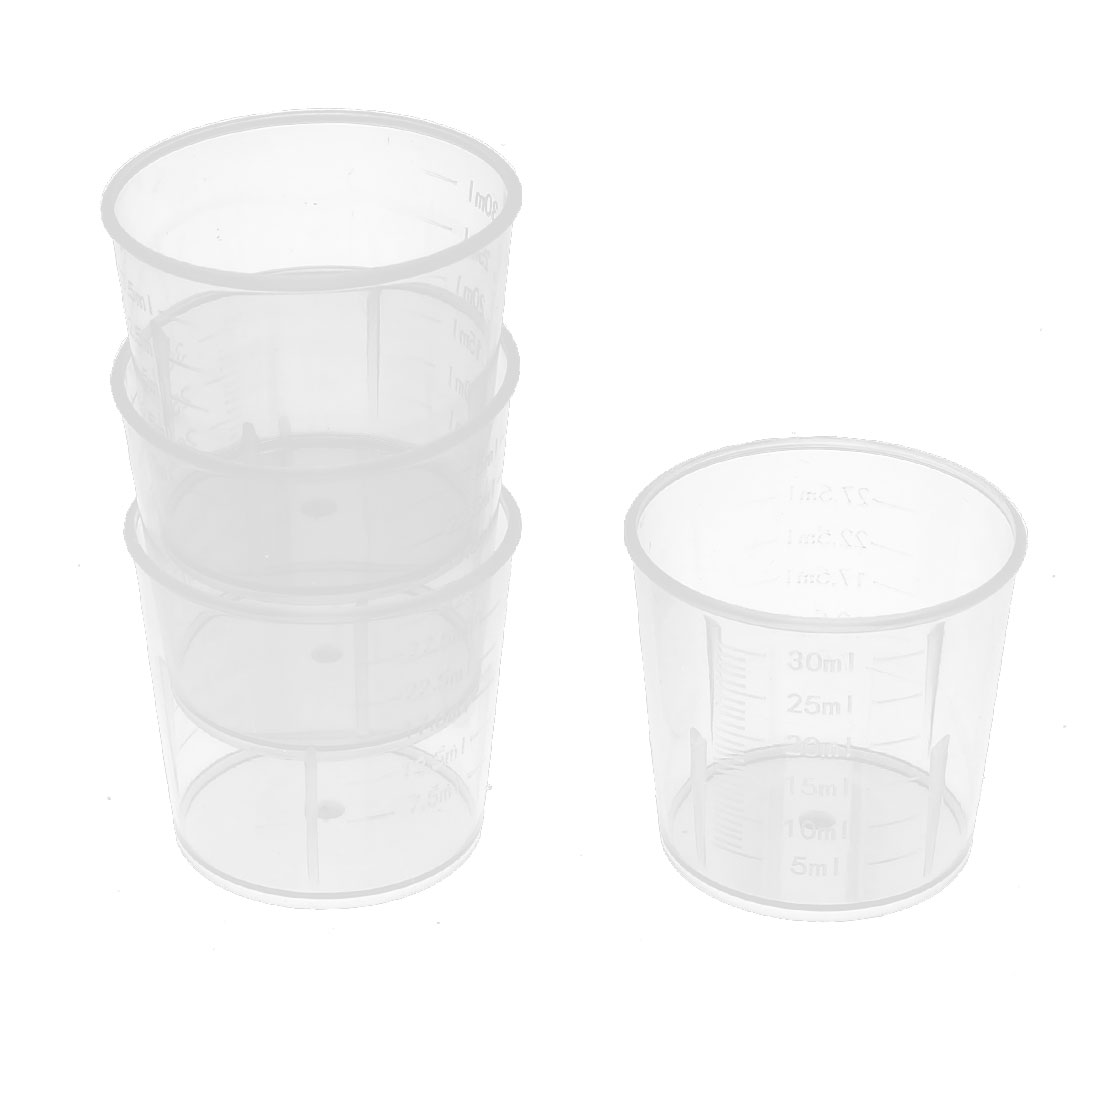 4 Pcs 30ml Clear White Plastic medicine measuring Measure cups gallipots